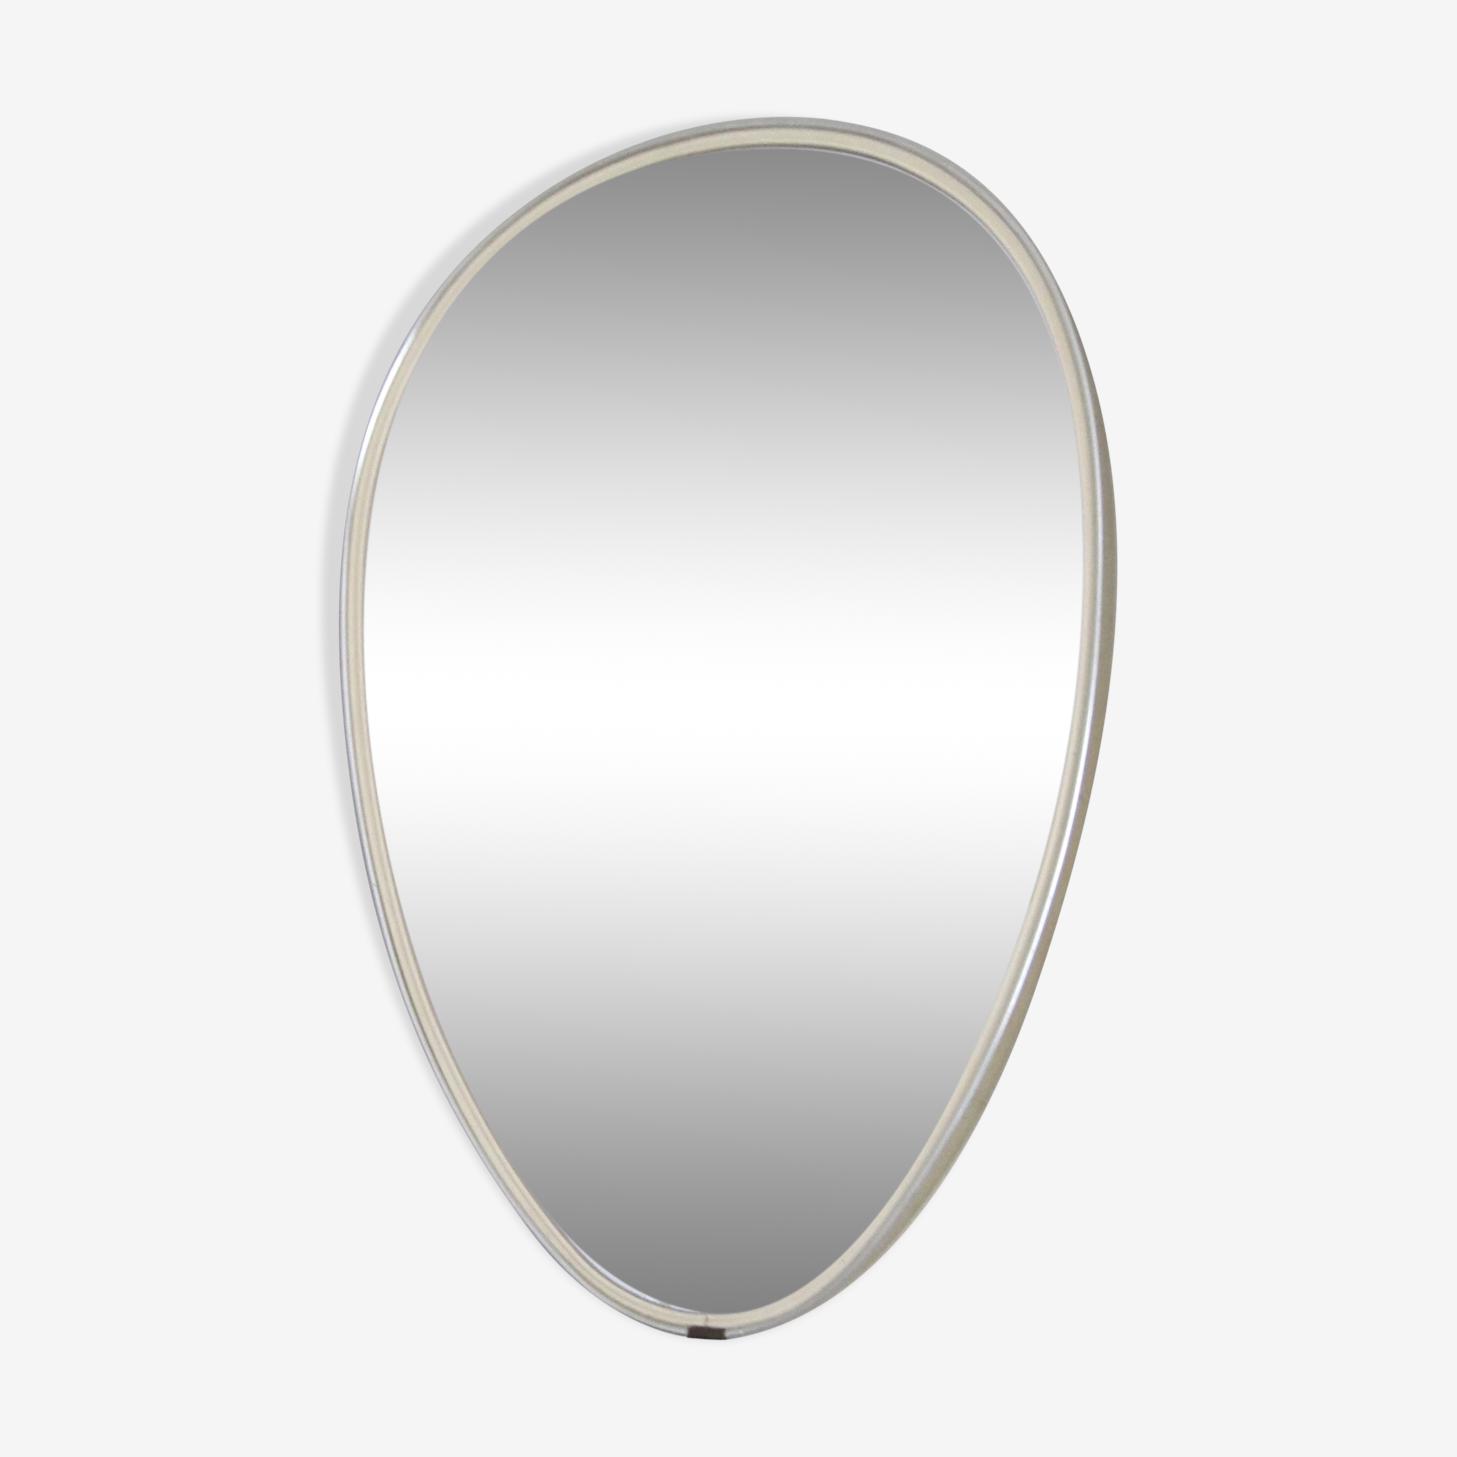 Asymmetric mirror 33x48cm